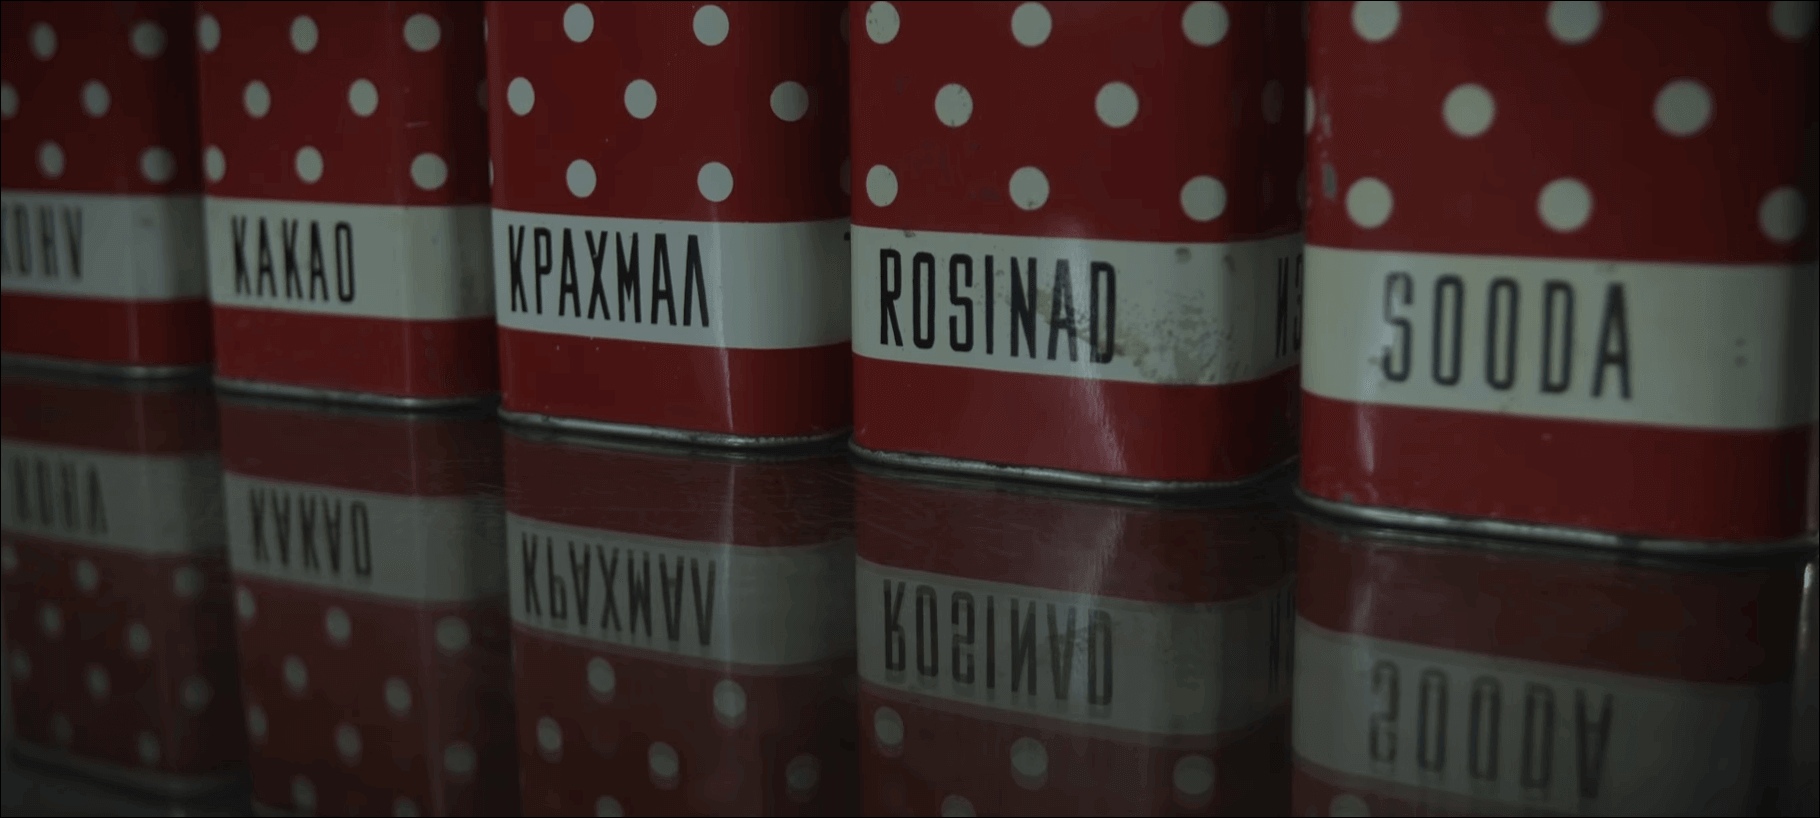 3 Фото квест комнаты Путешествие во времени в городе Киев